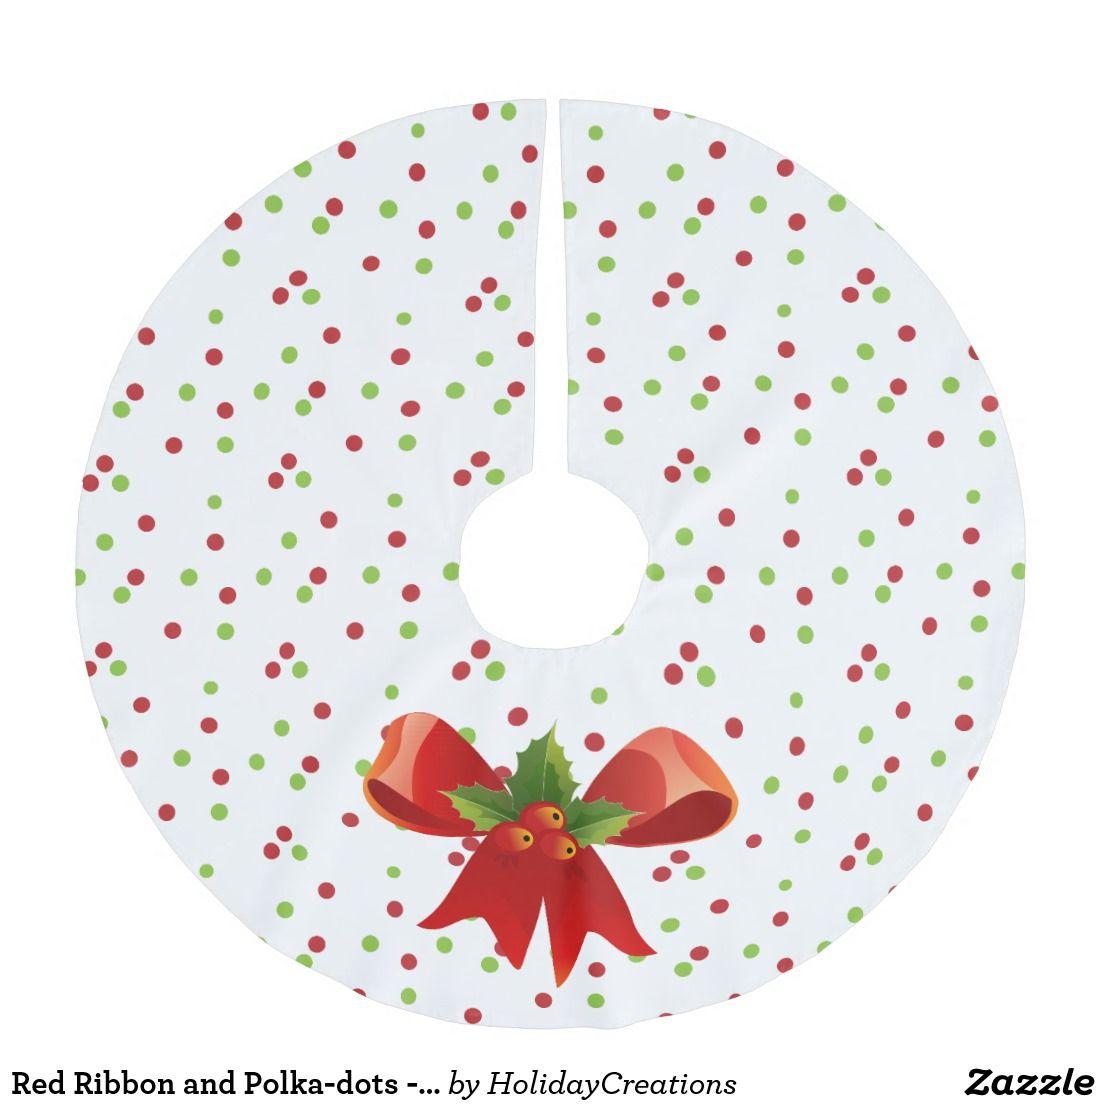 Red Ribbon and Polka-dots - Christmas Tree Skirt #christmasdecor #treeskirts #polkadots ...